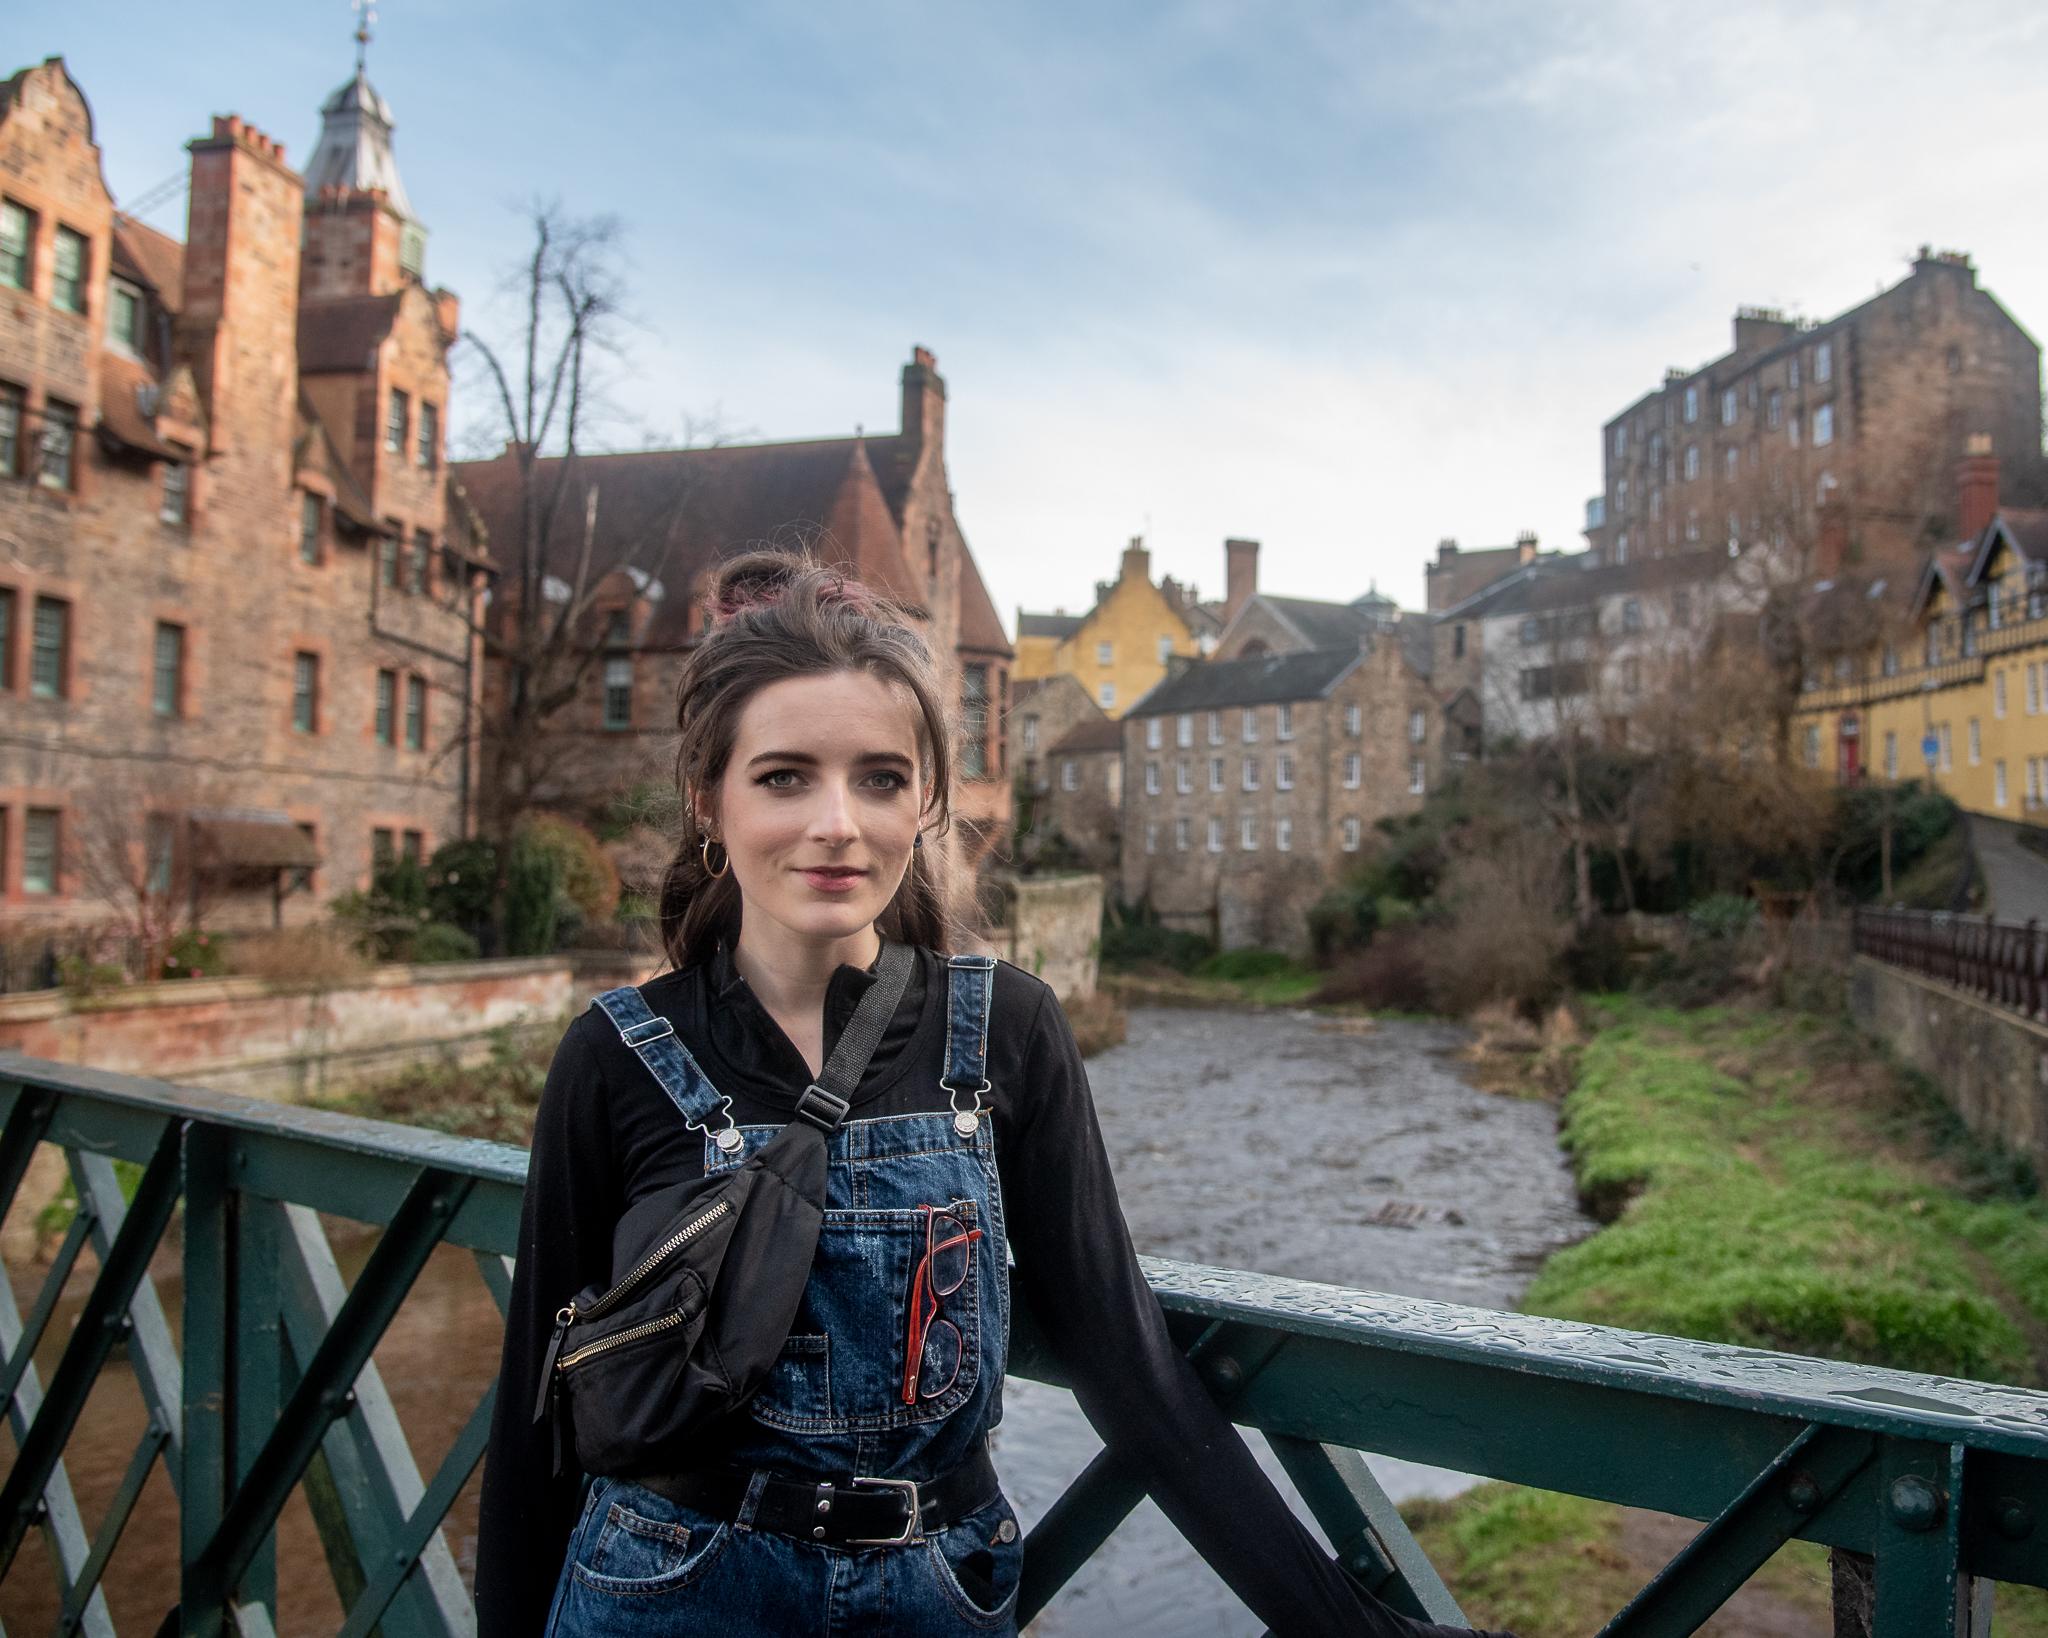 edinburgh, scotland, dean village, architecture, tinyboots, river, bokeh